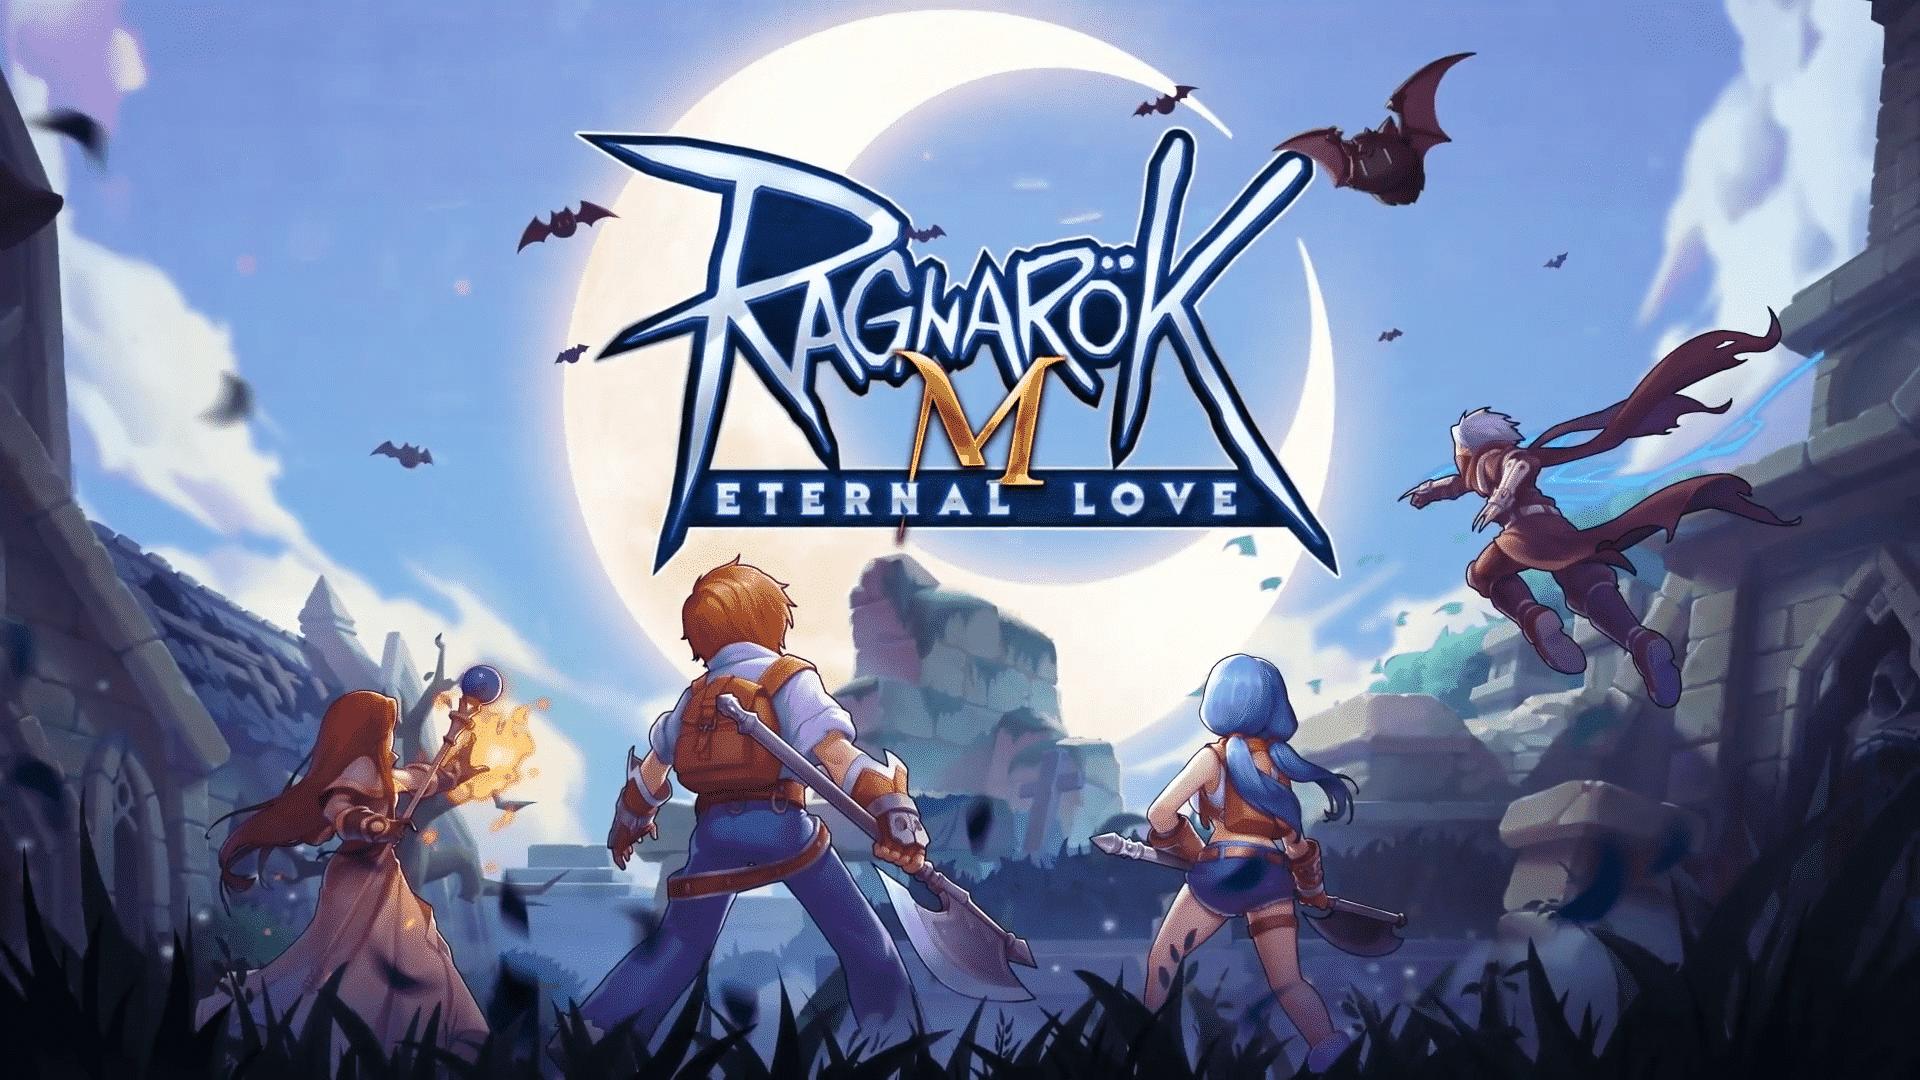 Ragnarok-M-Eternal-Love